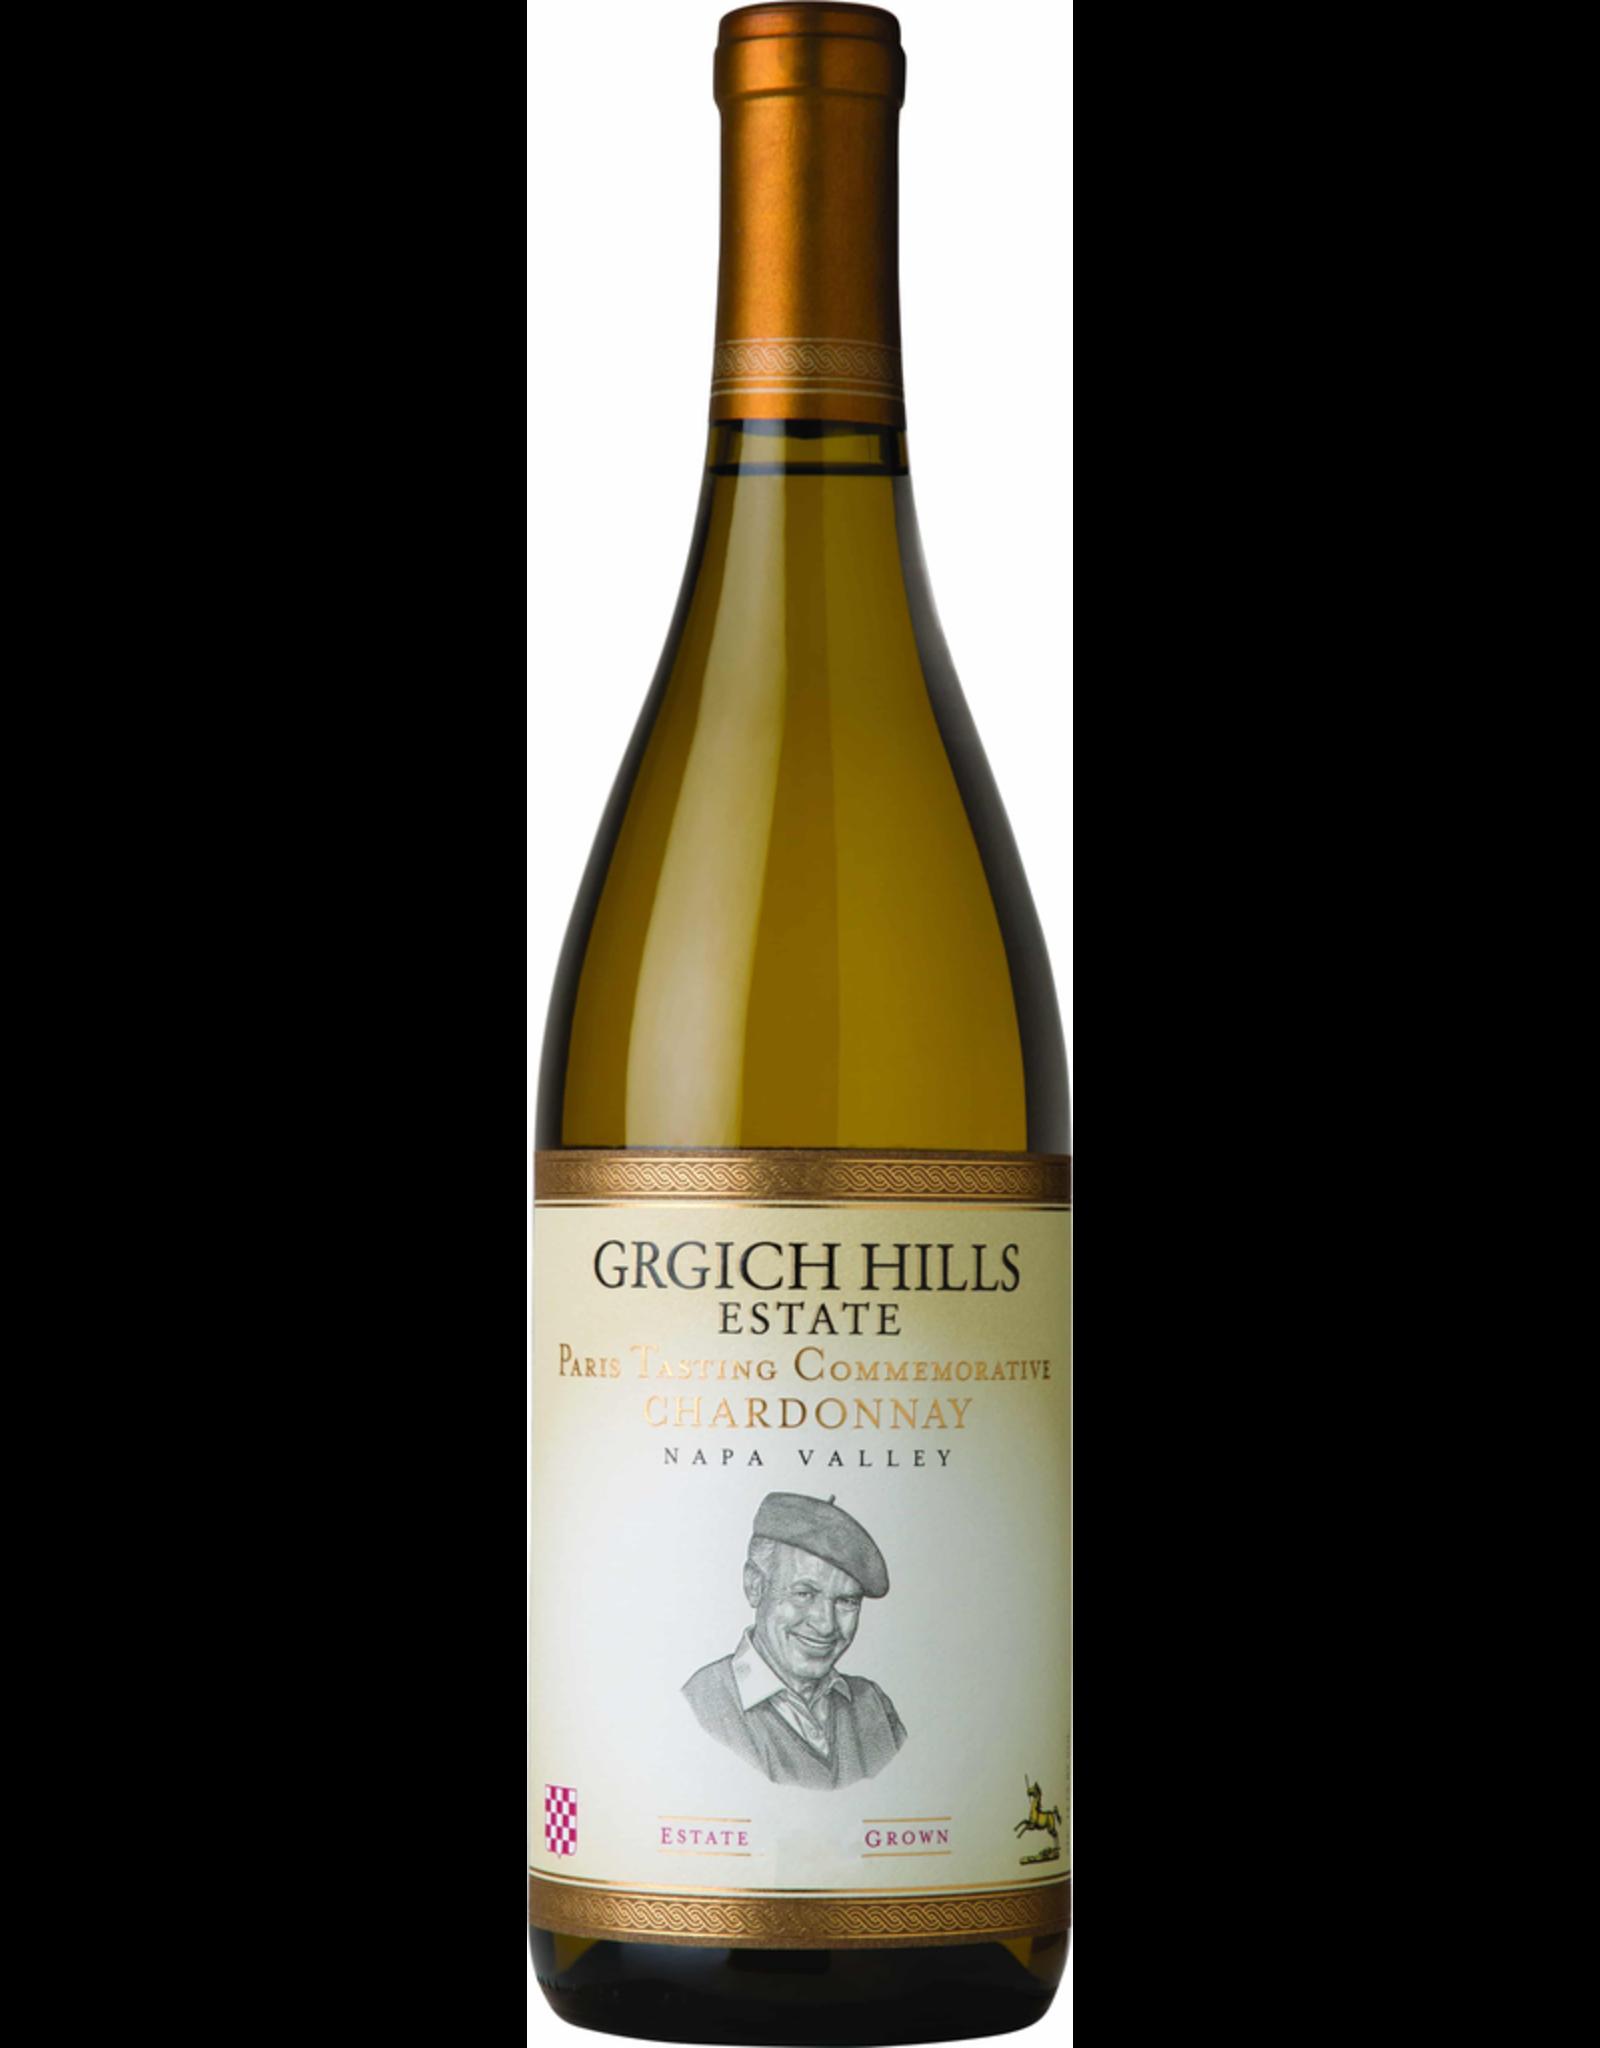 White Wine 2014, Grgich Hills Estate Paris Tasing Commemorative, Chardonnay, Napa Valley, Central Coast, California, USA, 14.1 Alc, CT95, TW95